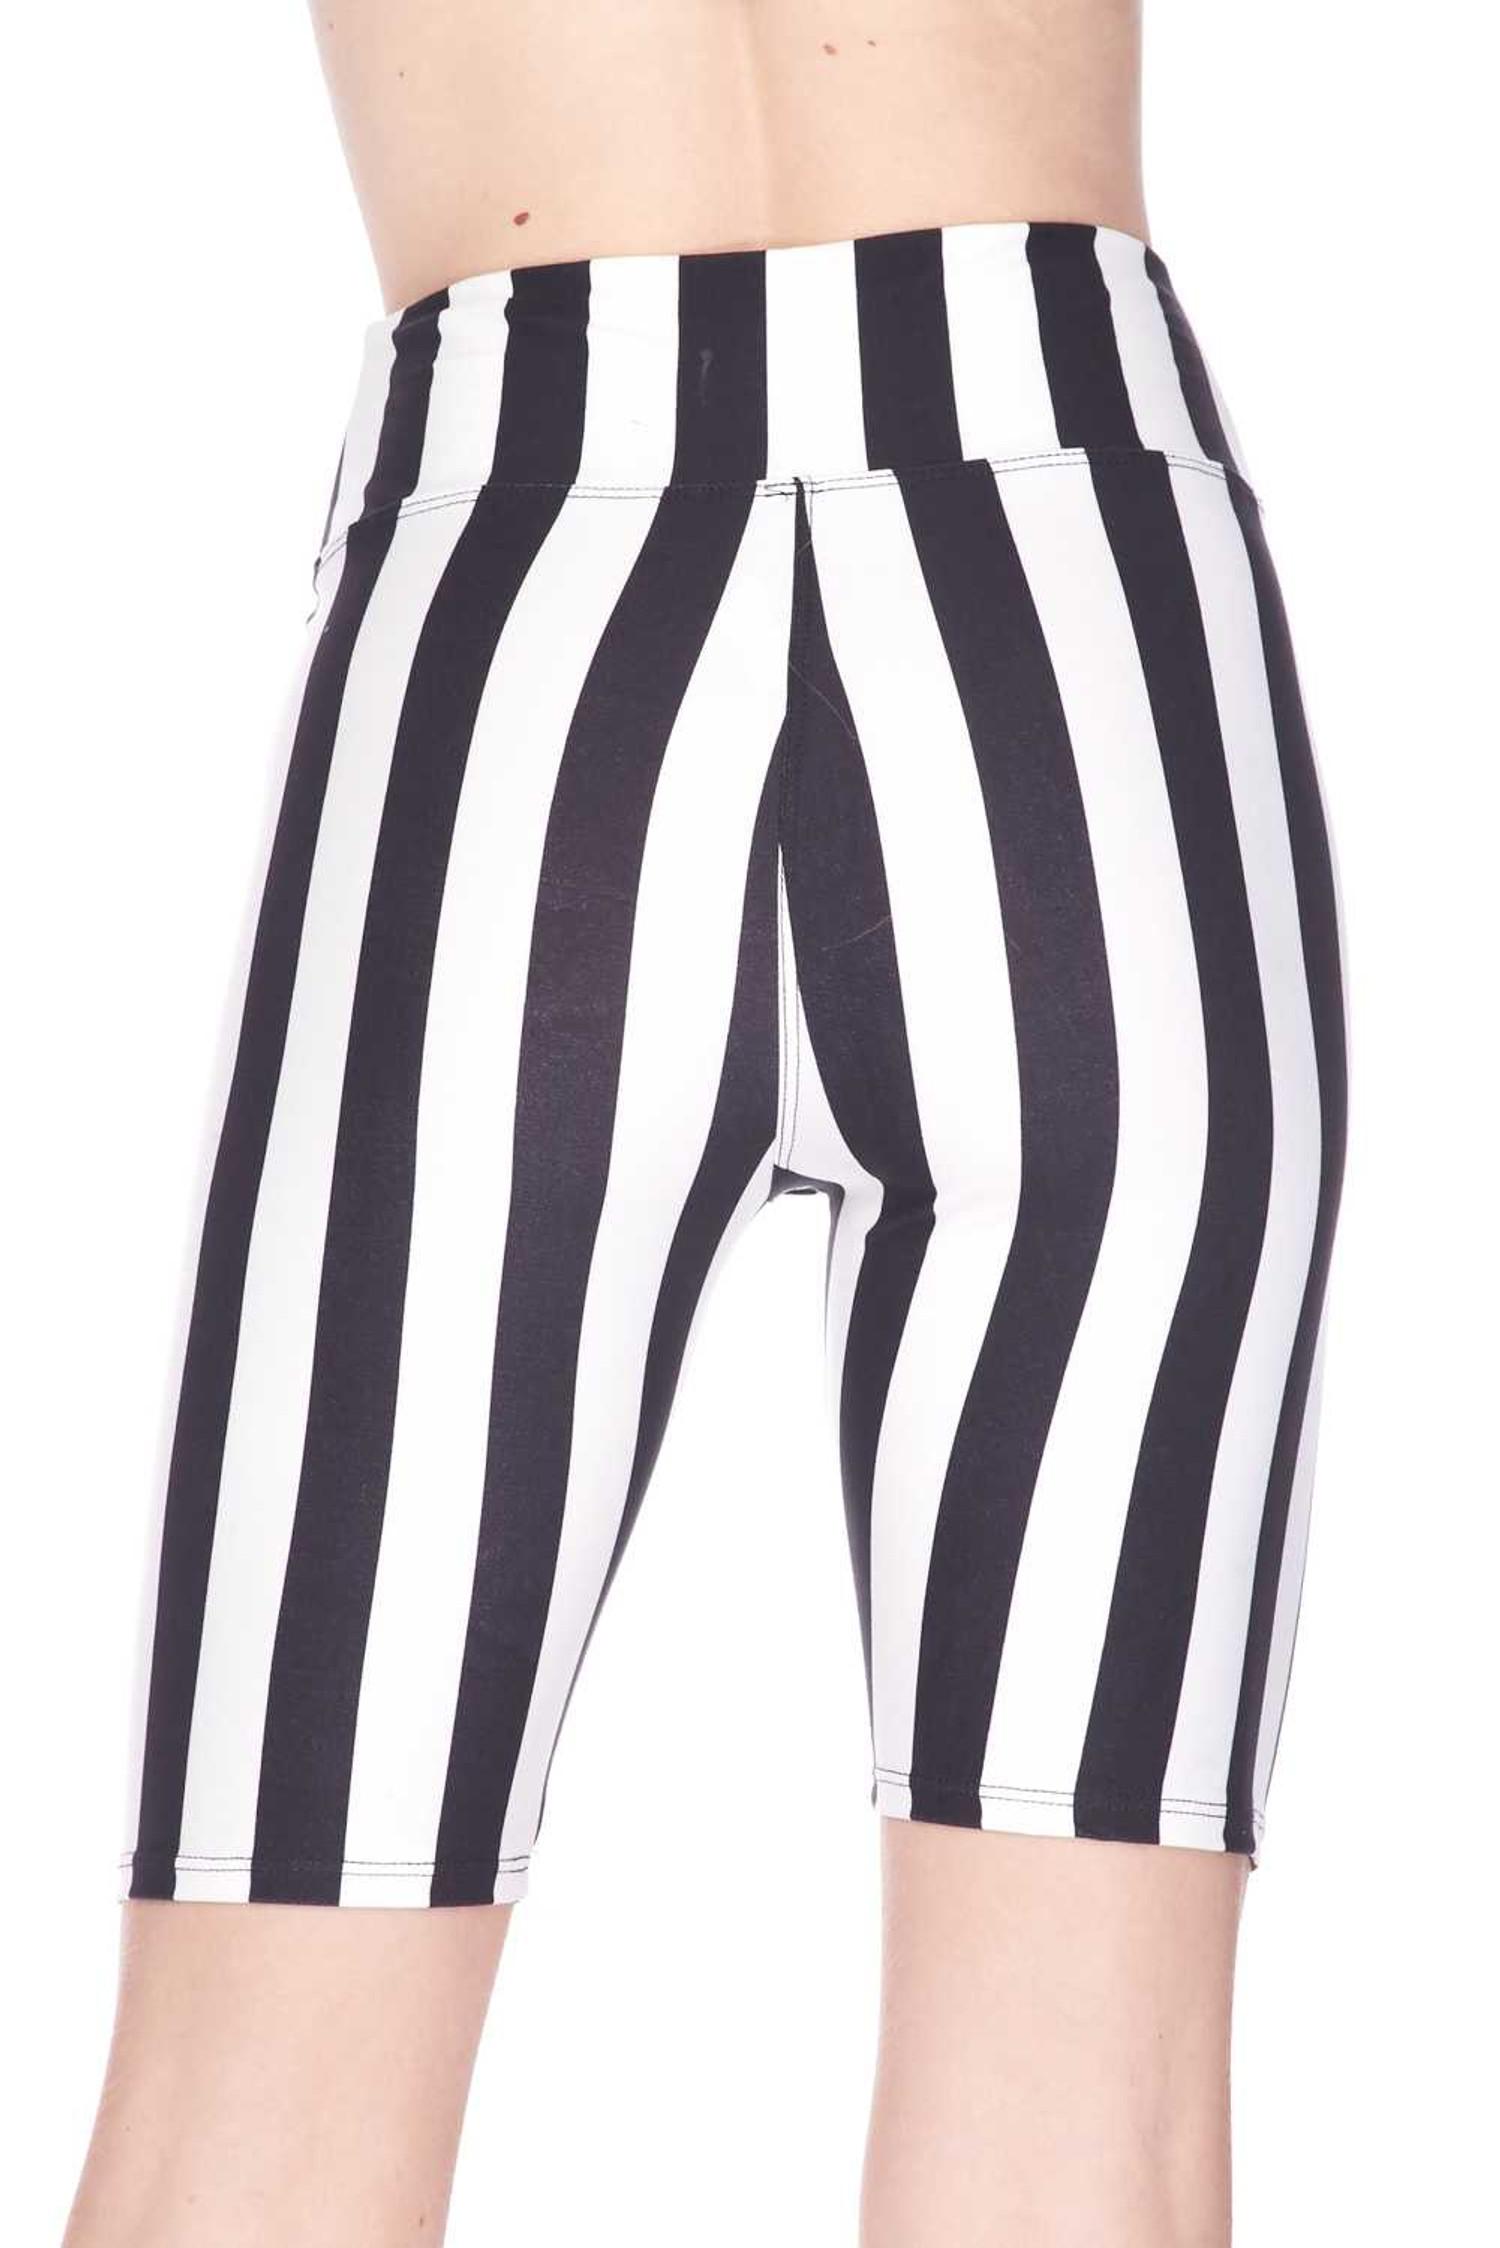 Buttery Soft Vertical Wide Stripe Plus Size Biker Shorts - 3 Inch Waist Band